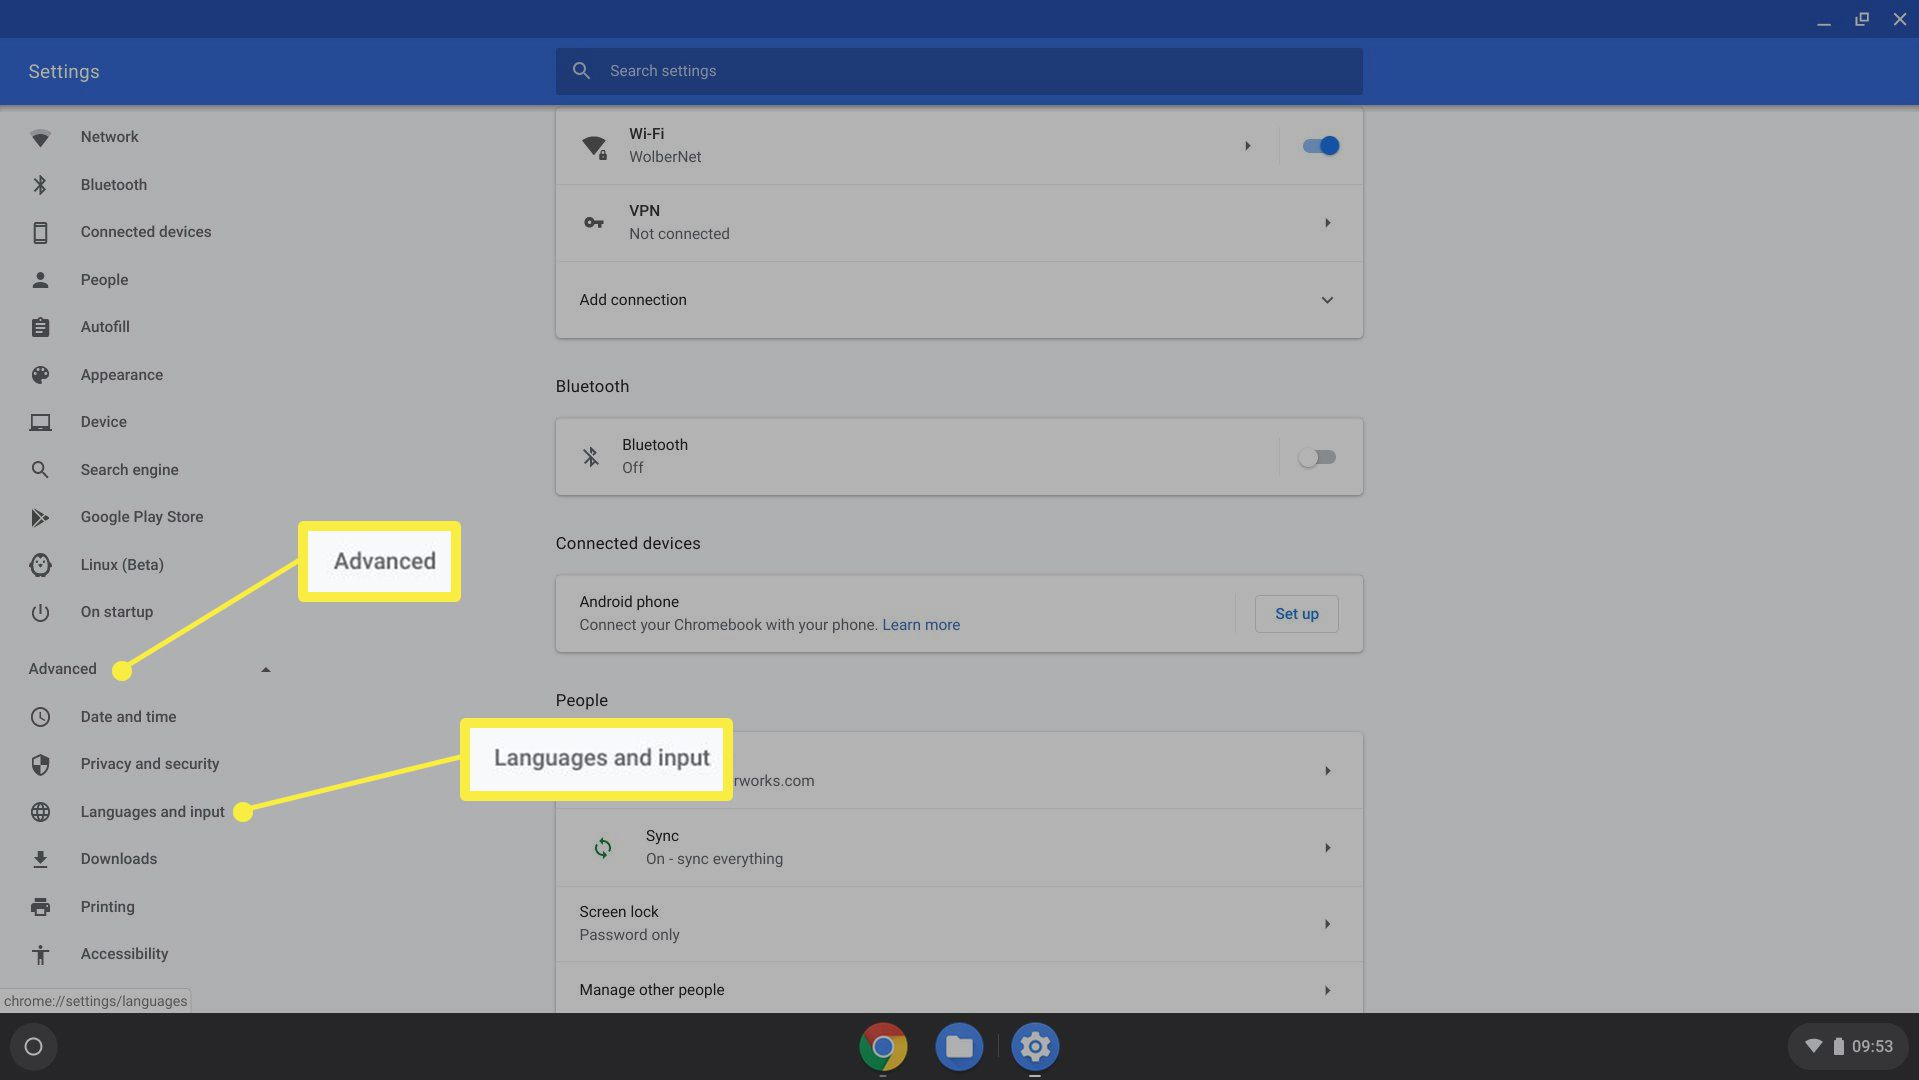 Language & Input settings selection